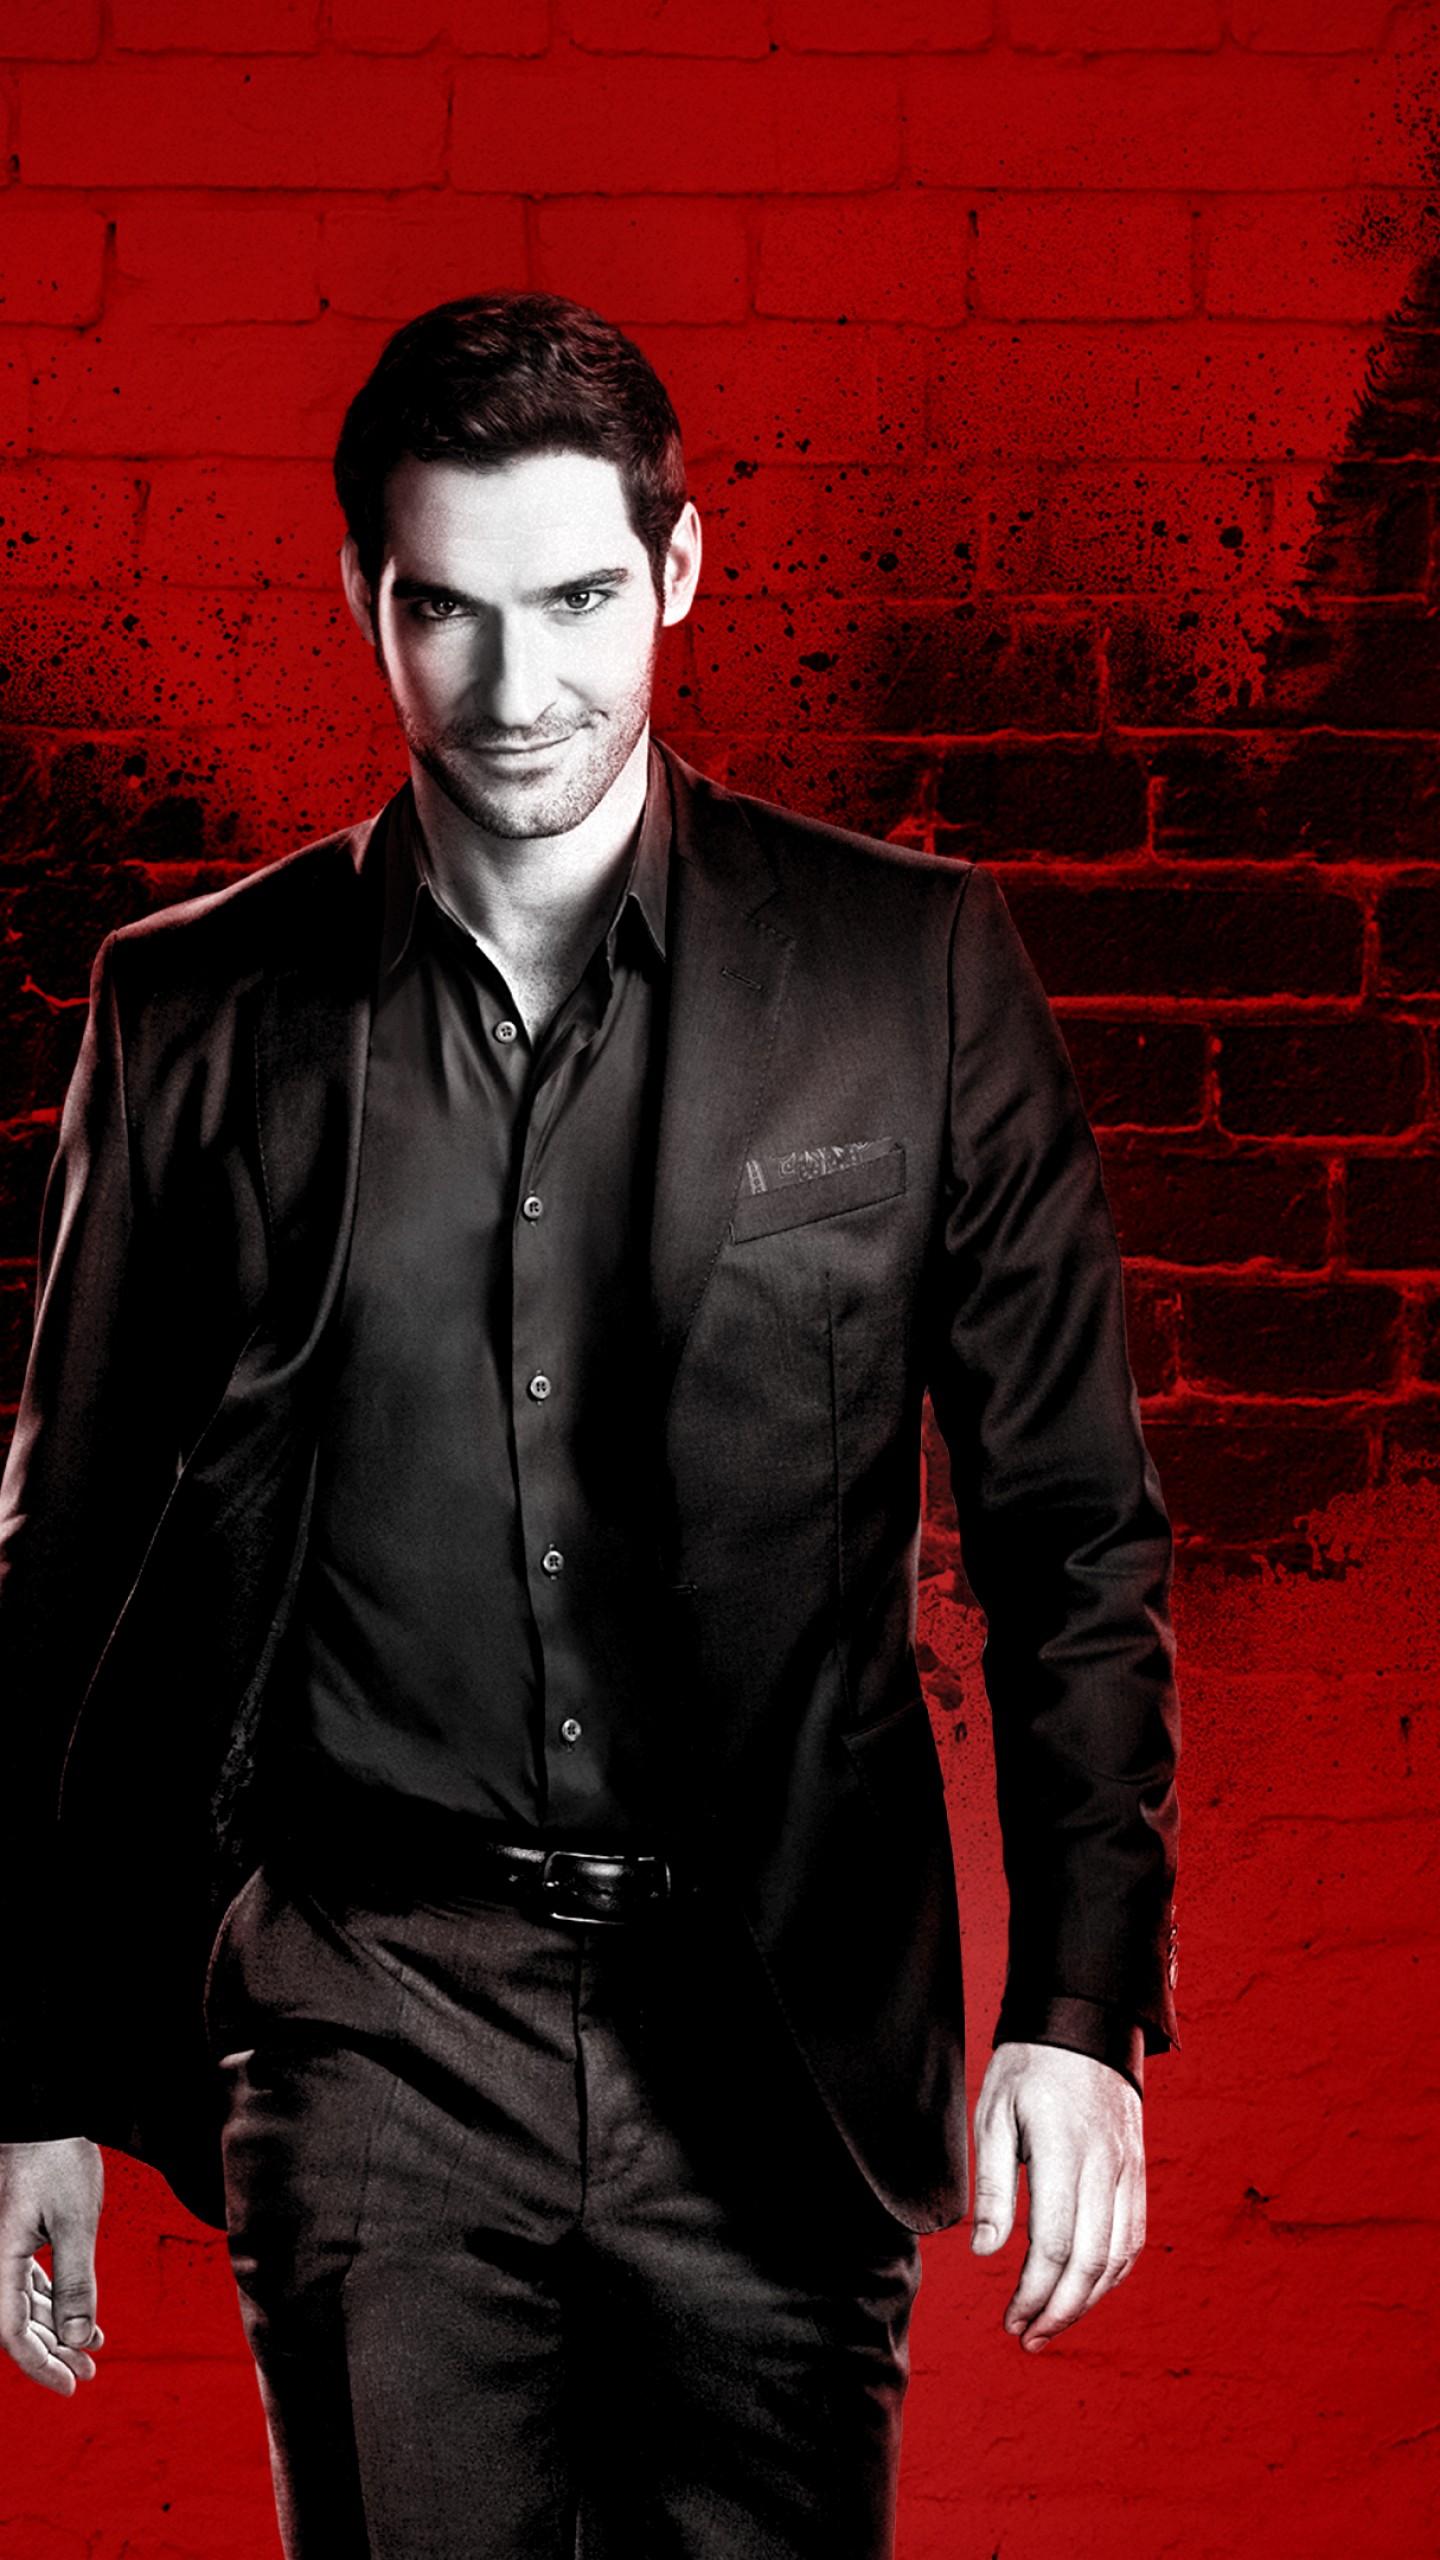 Wallpaper Lucifer Season 3 Tom Ellis Tv Series 4k Movies 15887